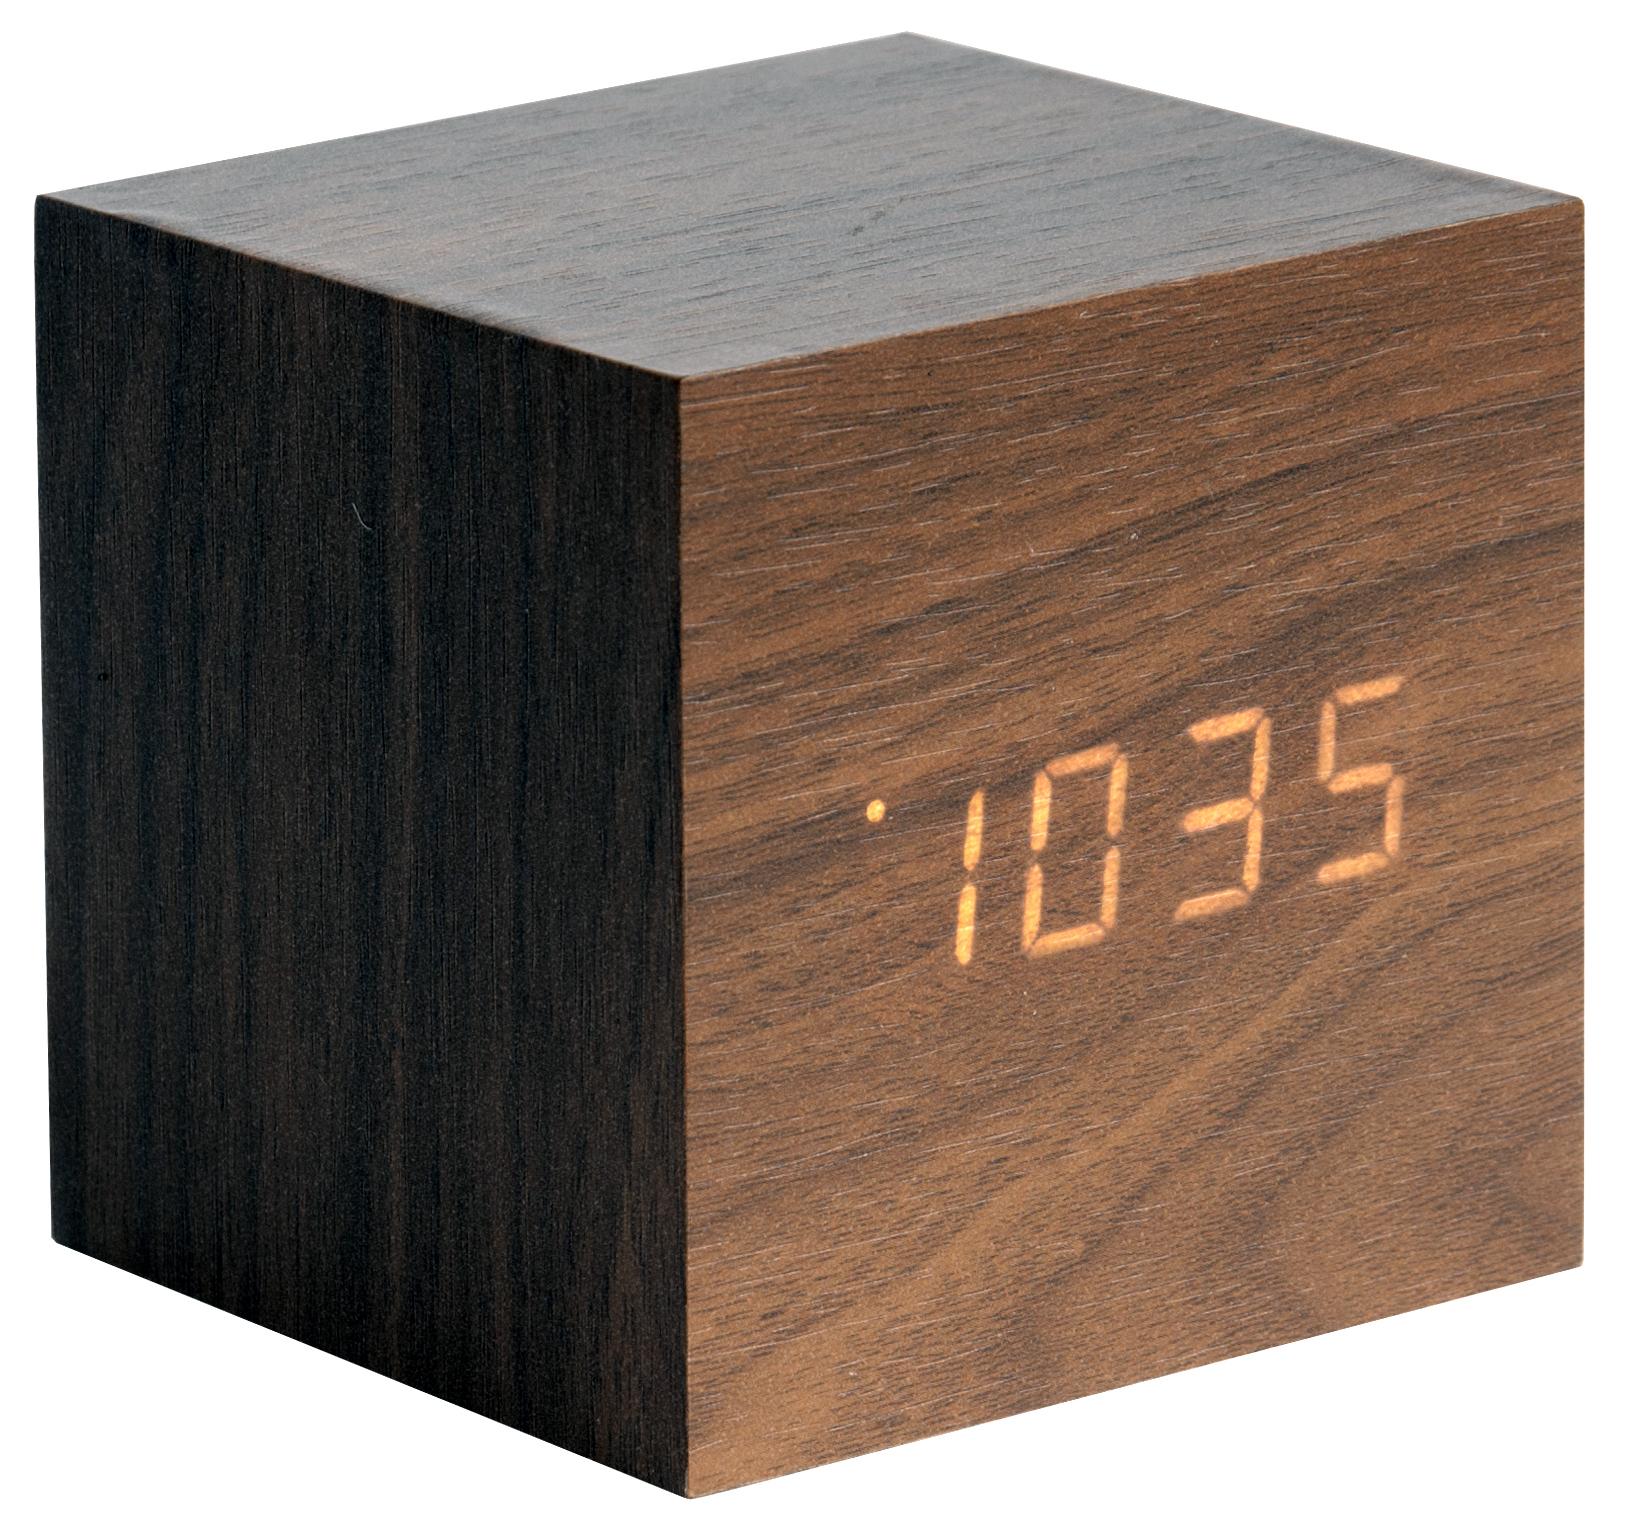 karlsson wecker tischuhr led cube ka5655dw g nstig auf. Black Bedroom Furniture Sets. Home Design Ideas